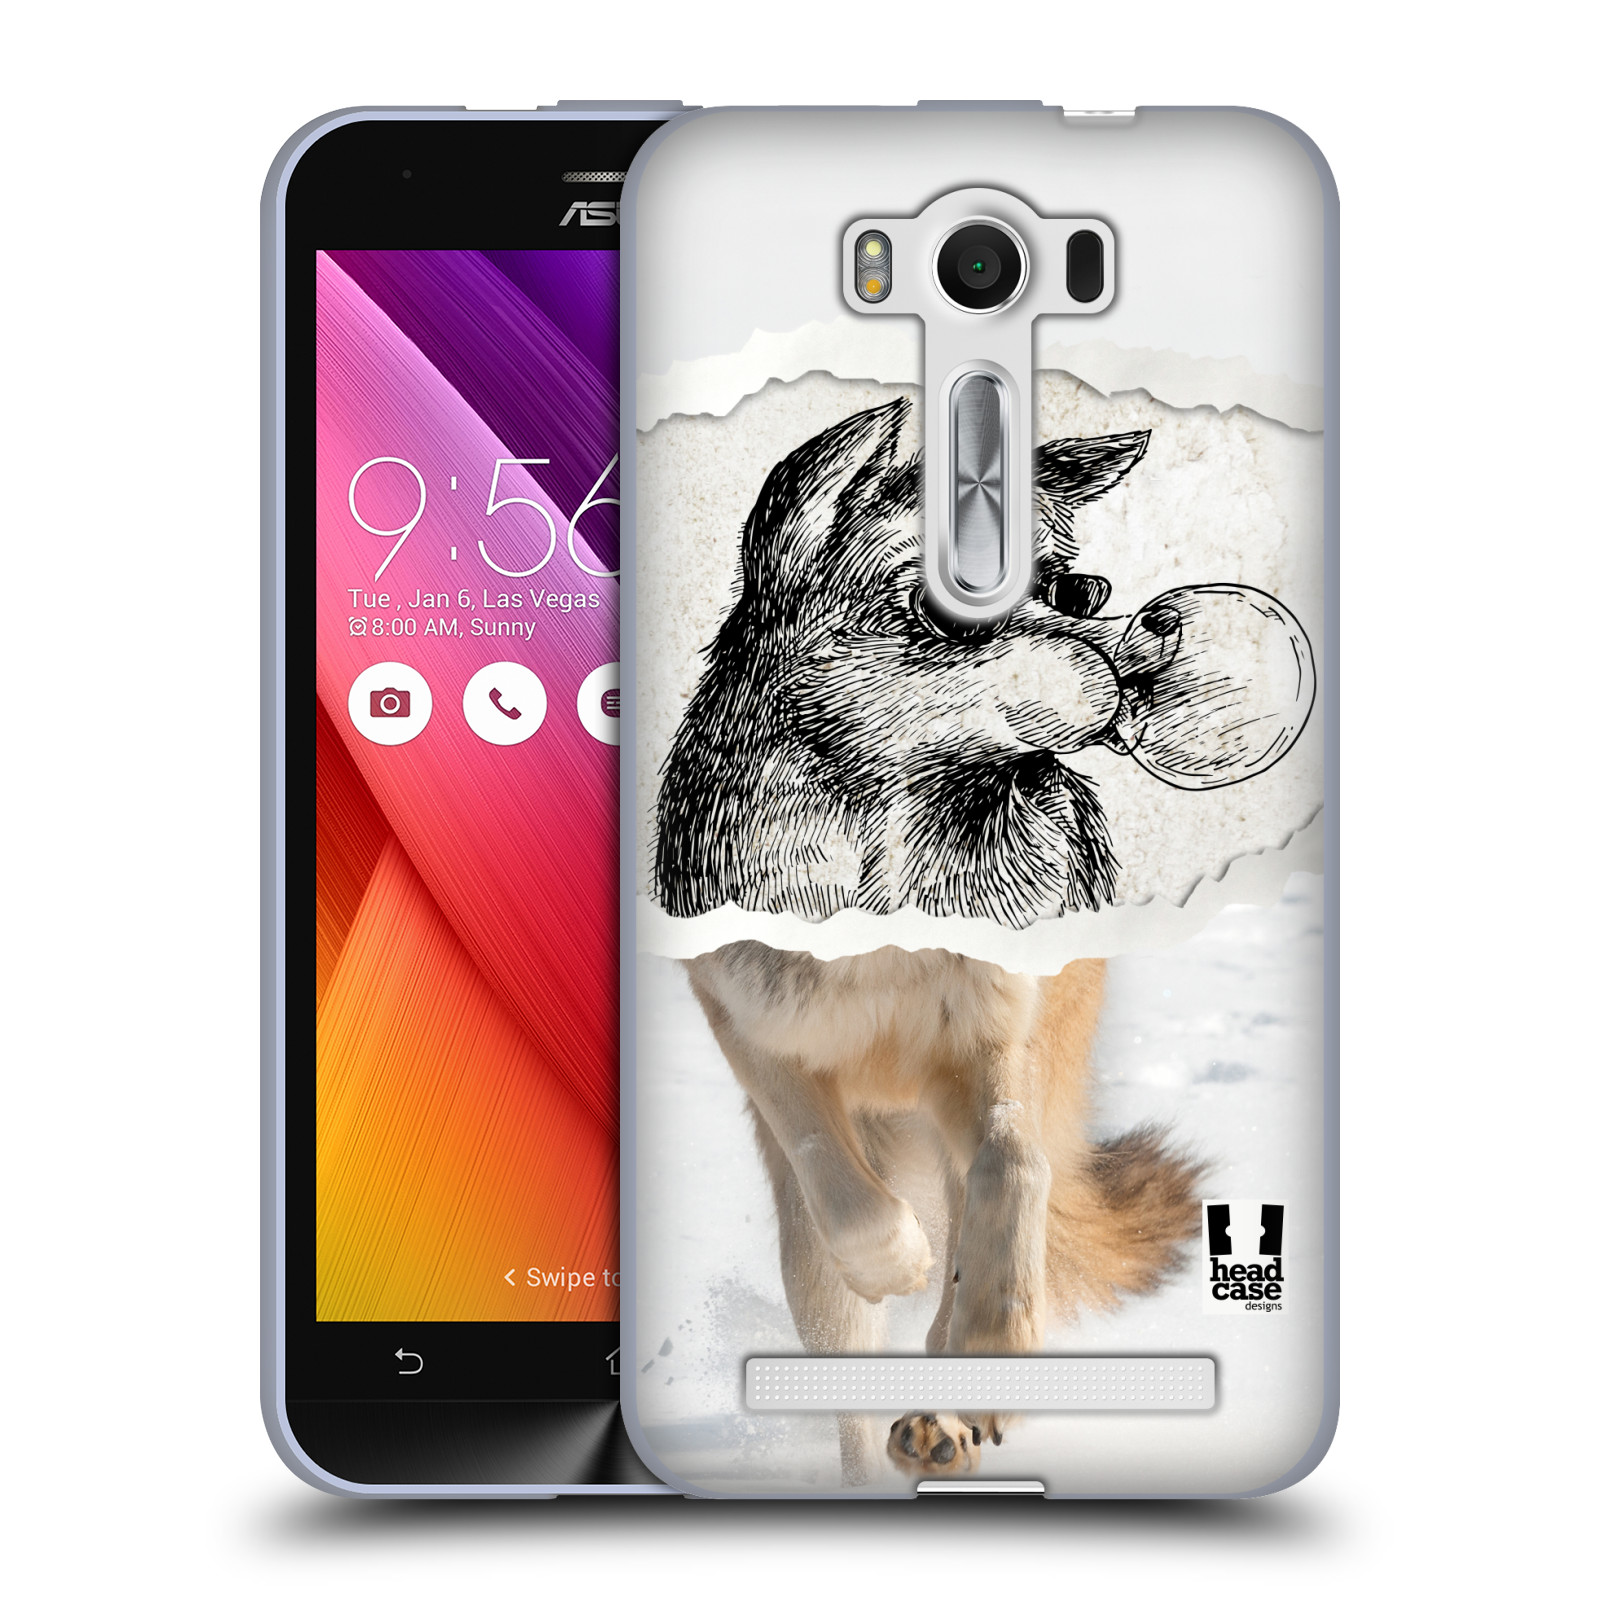 "HEAD CASE silikonový obal na mobil Asus Zenfone 2 LASER (ZE500KL s 5"" displejem) vzor zvířata koláž vlk pohodář"